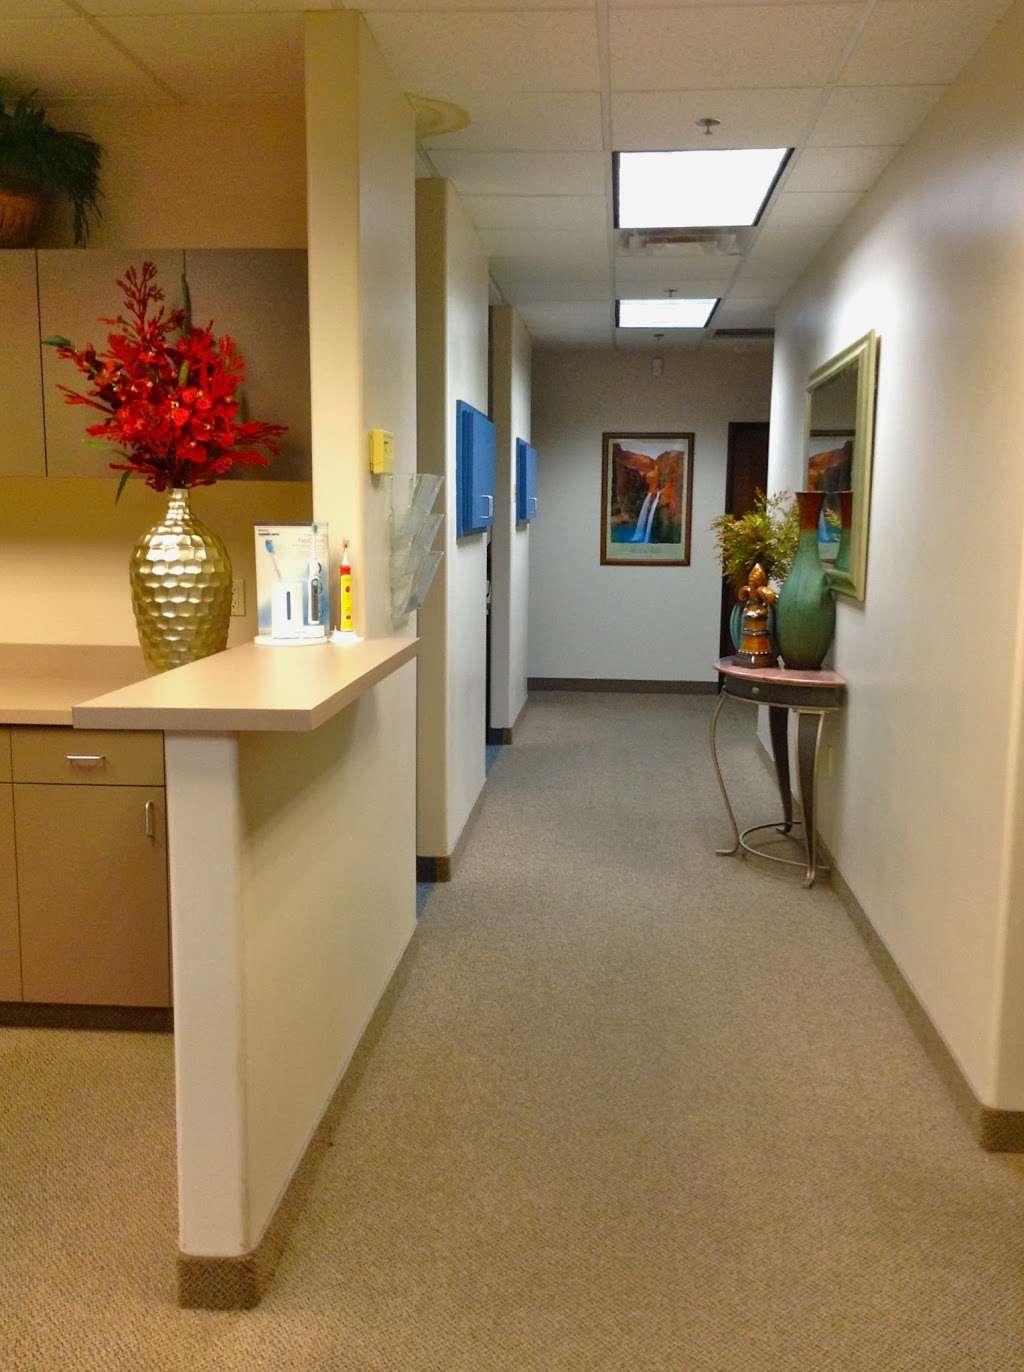 Red Rock Family Dentistry - dentist  | Photo 1 of 10 | Address: 908 W Chandler Blvd # C-7, Chandler, AZ 85225, USA | Phone: (480) 782-8111